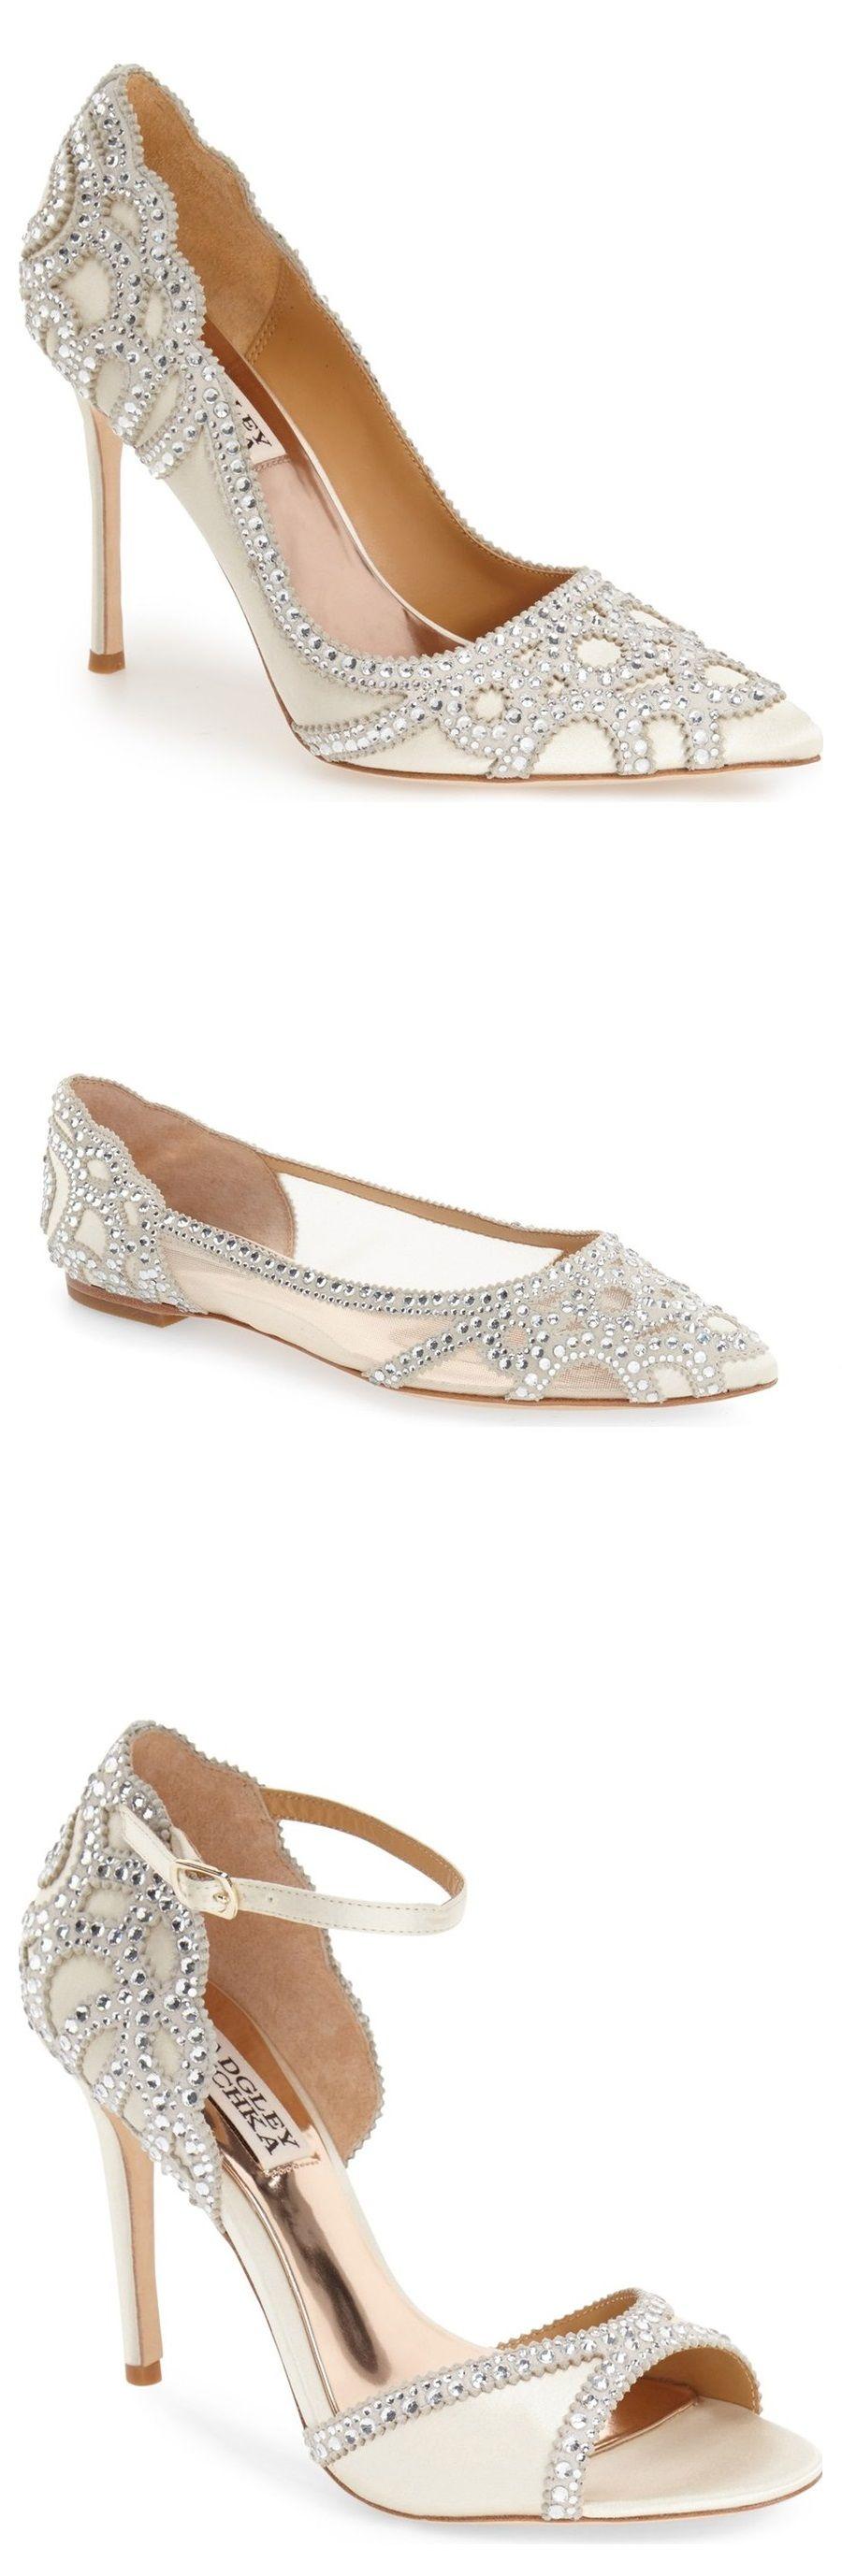 Stunning bridal shoes Bride shoes flats, Wedding shoes